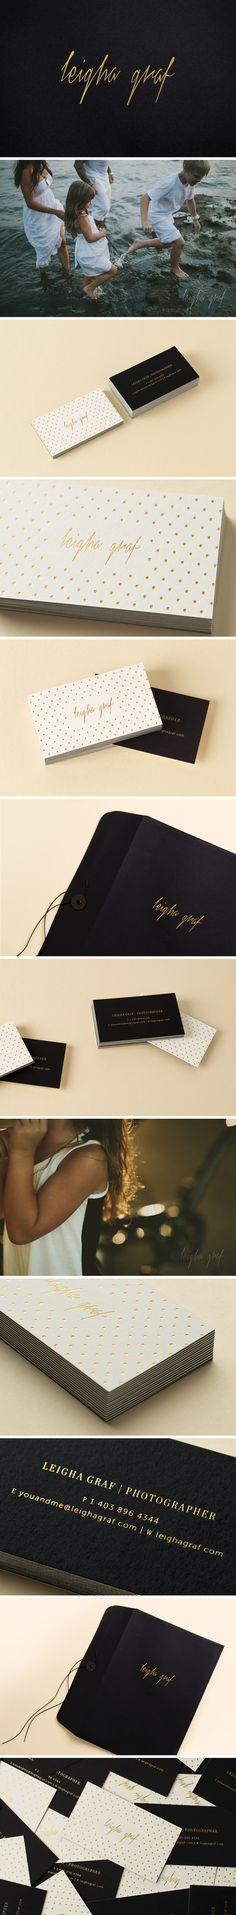 Leigha Graf Photography Brand Identity - One Plus One Design #Brand #Identity #BrandIdentity #Branding